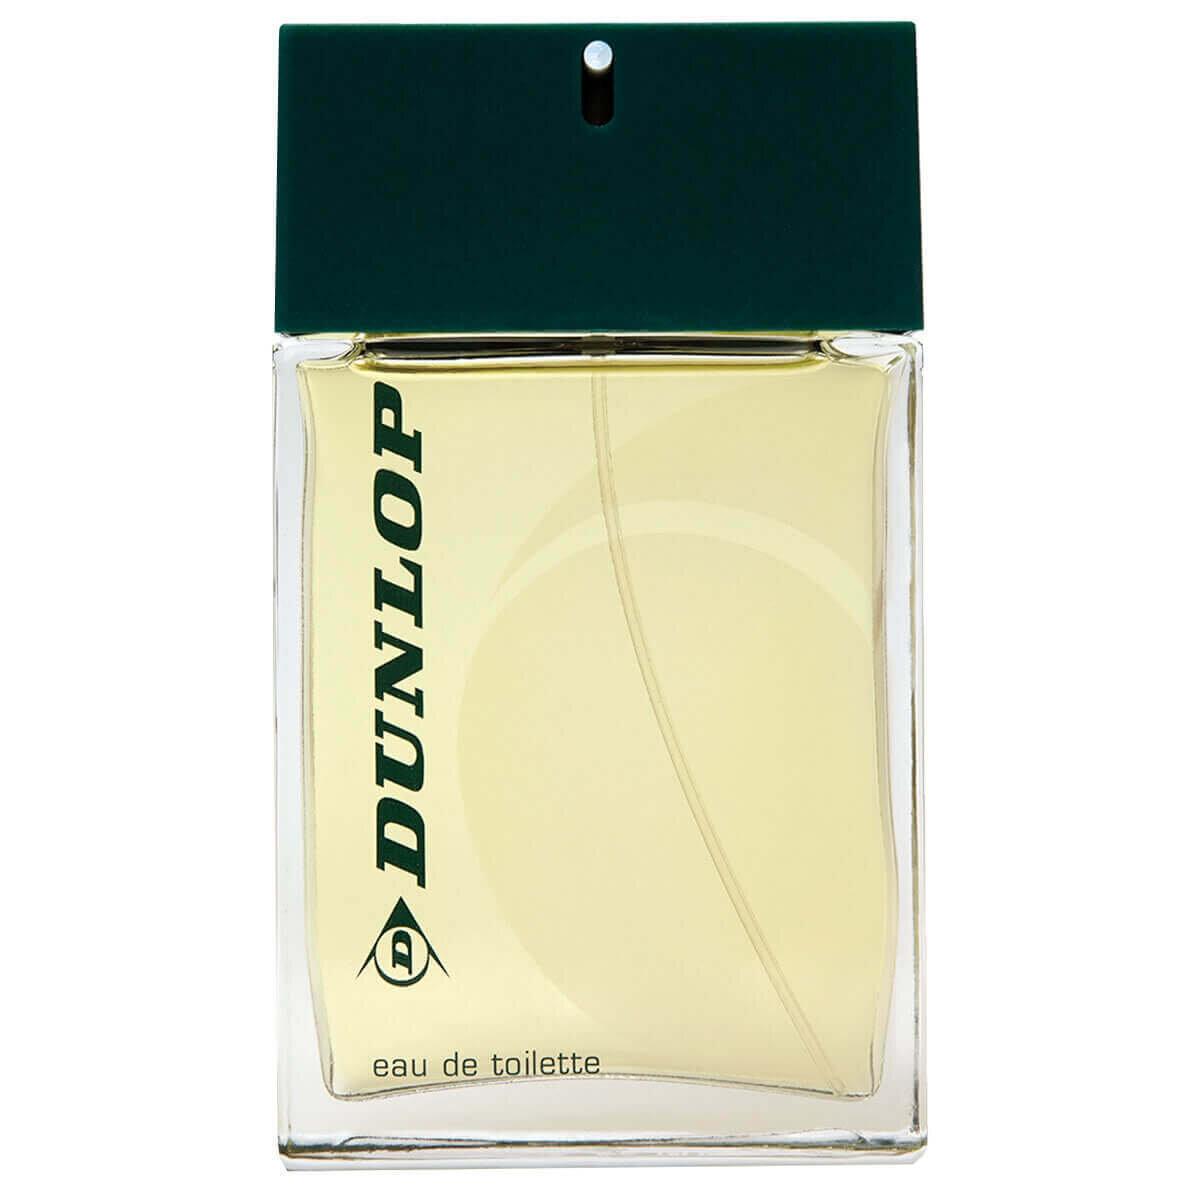 Erkek Parfümü Edt 100 ml